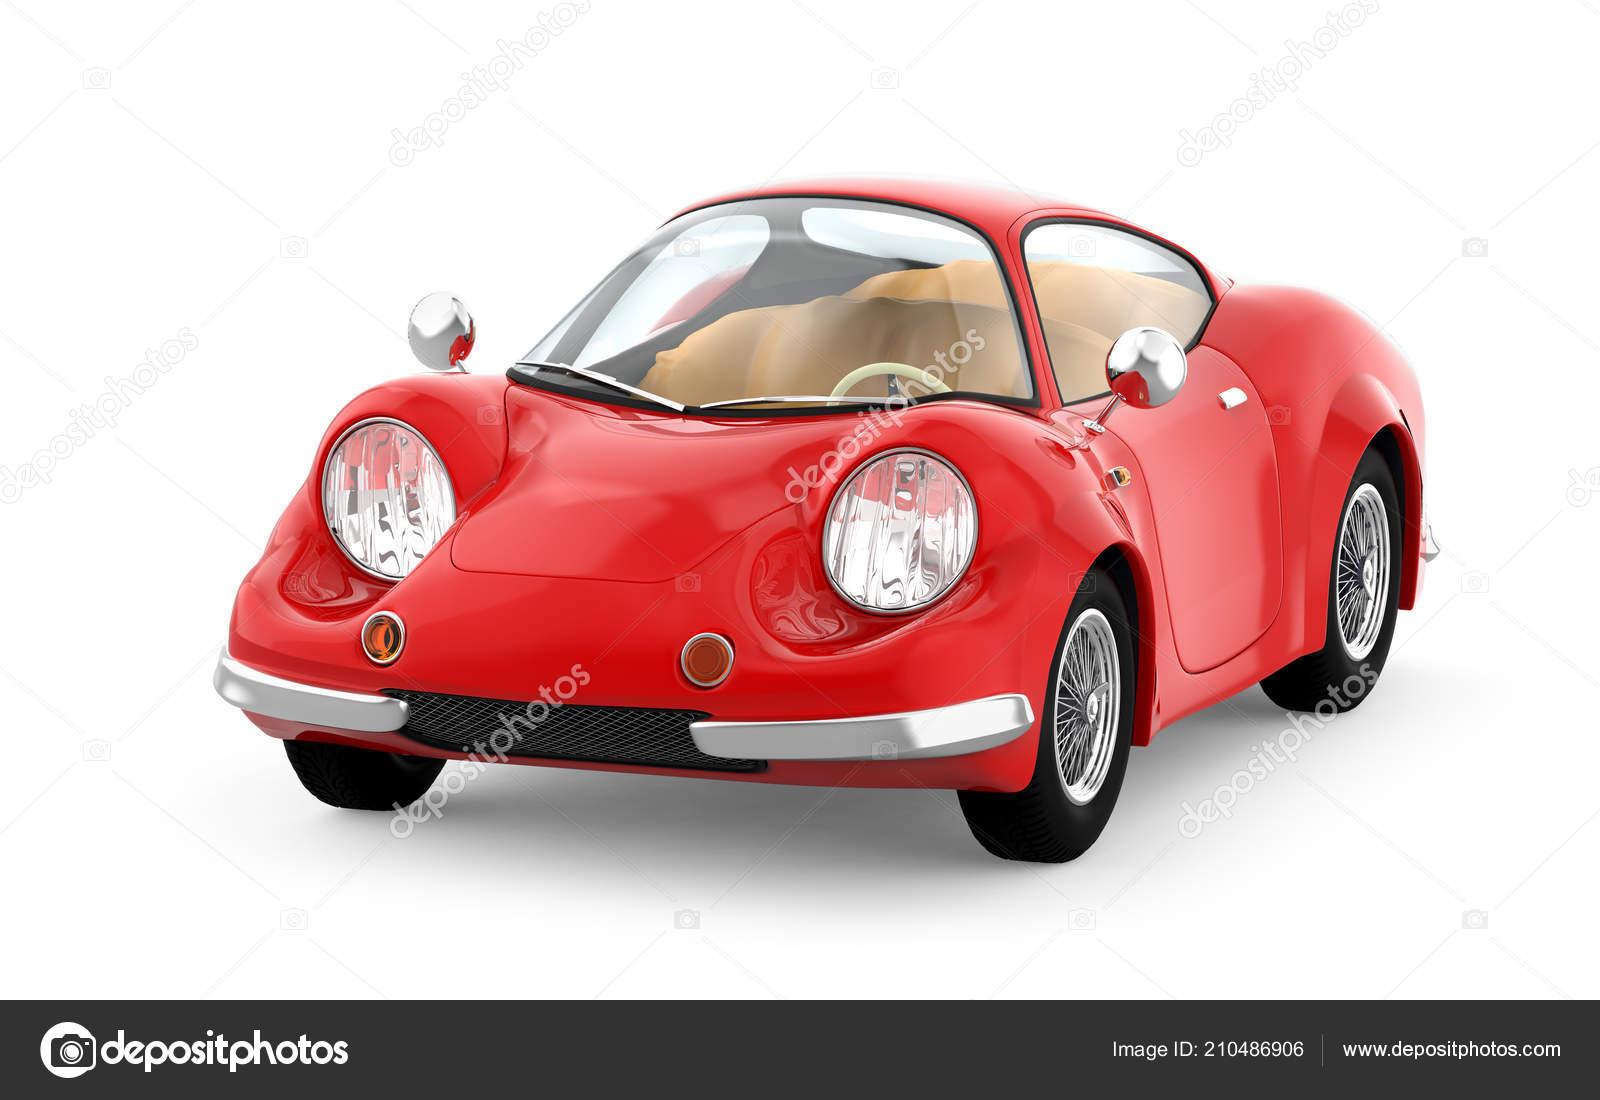 Retro Sport Car Cartoon 3d Stock Photo C Ilterriorm 210486906